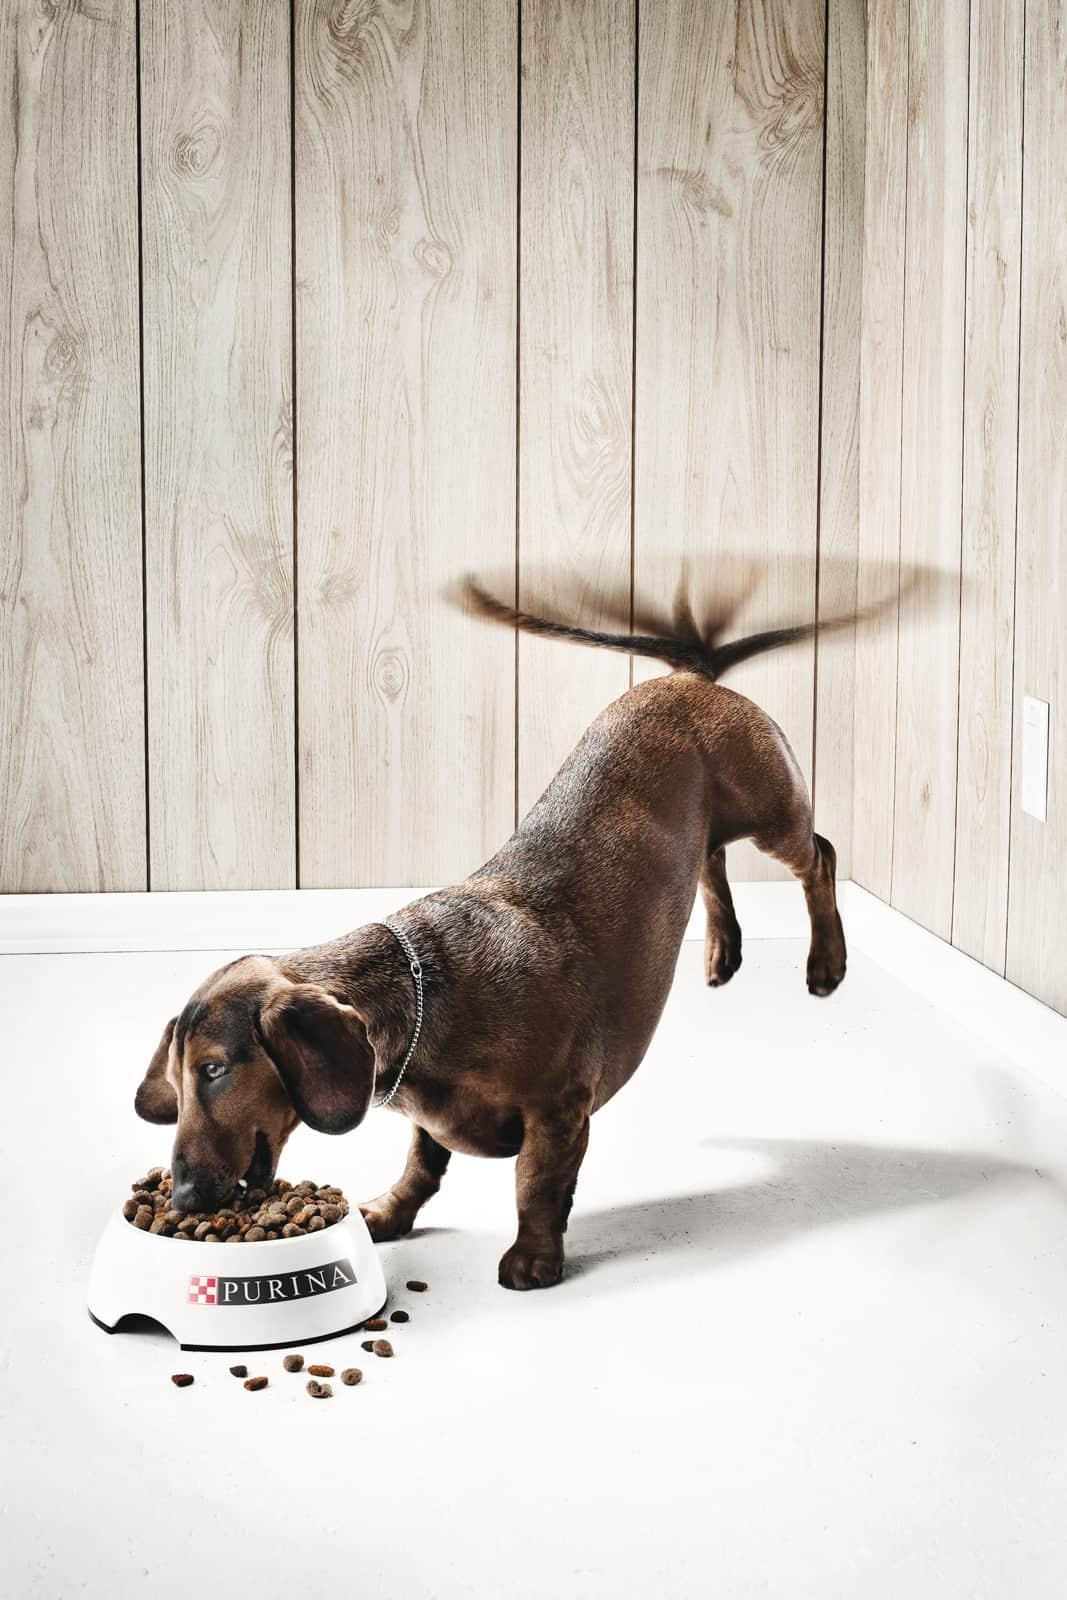 Purina : chien heureux